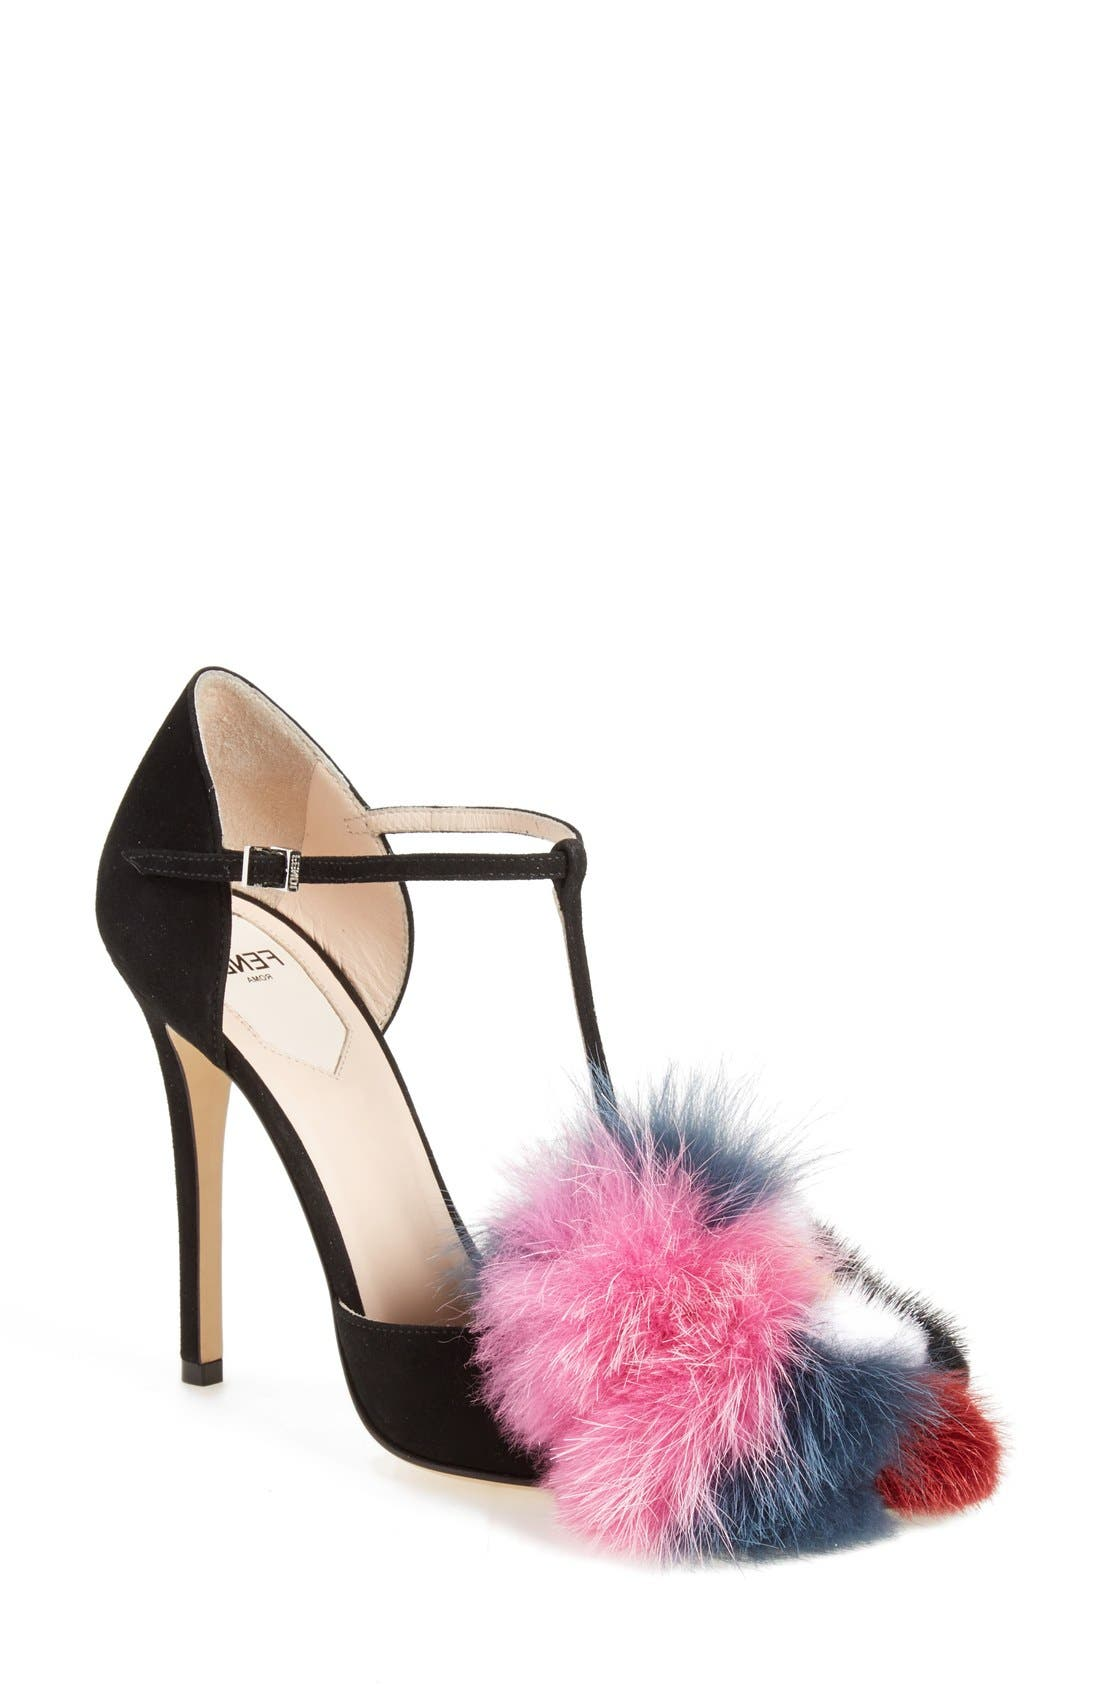 Main Image - Fendi 'Flowerland' Genuine Mink & Fux Fur Trim Sandal (Women)